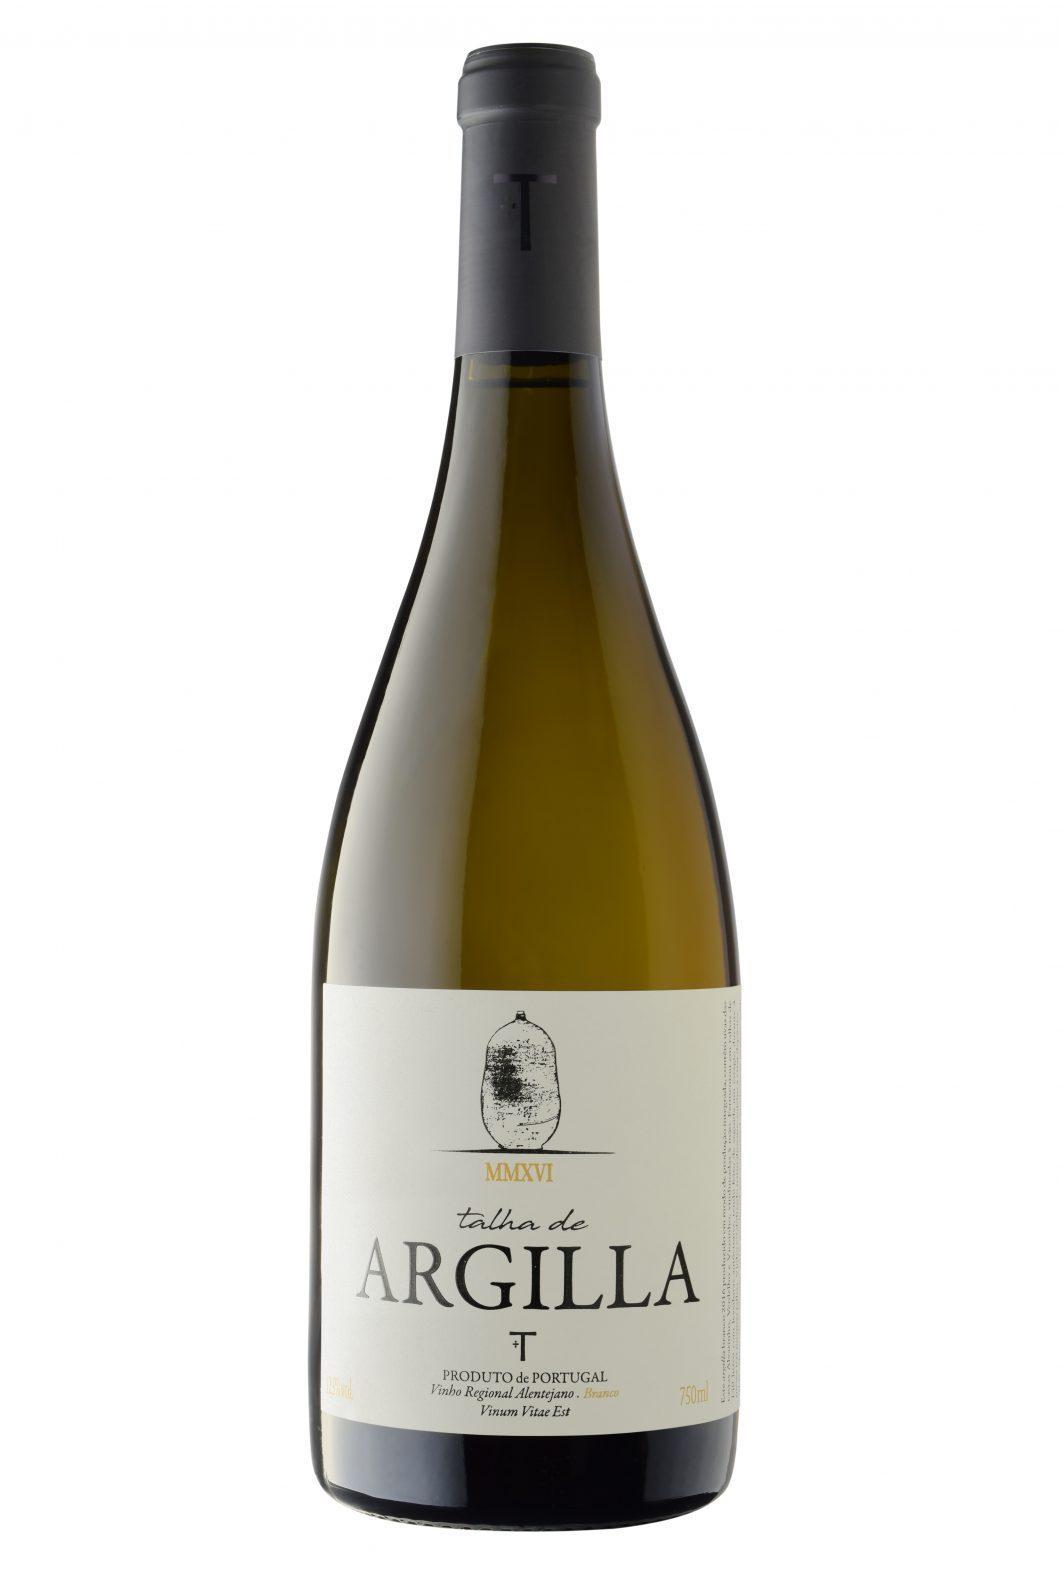 Red Wine Talha de Argilla 2015